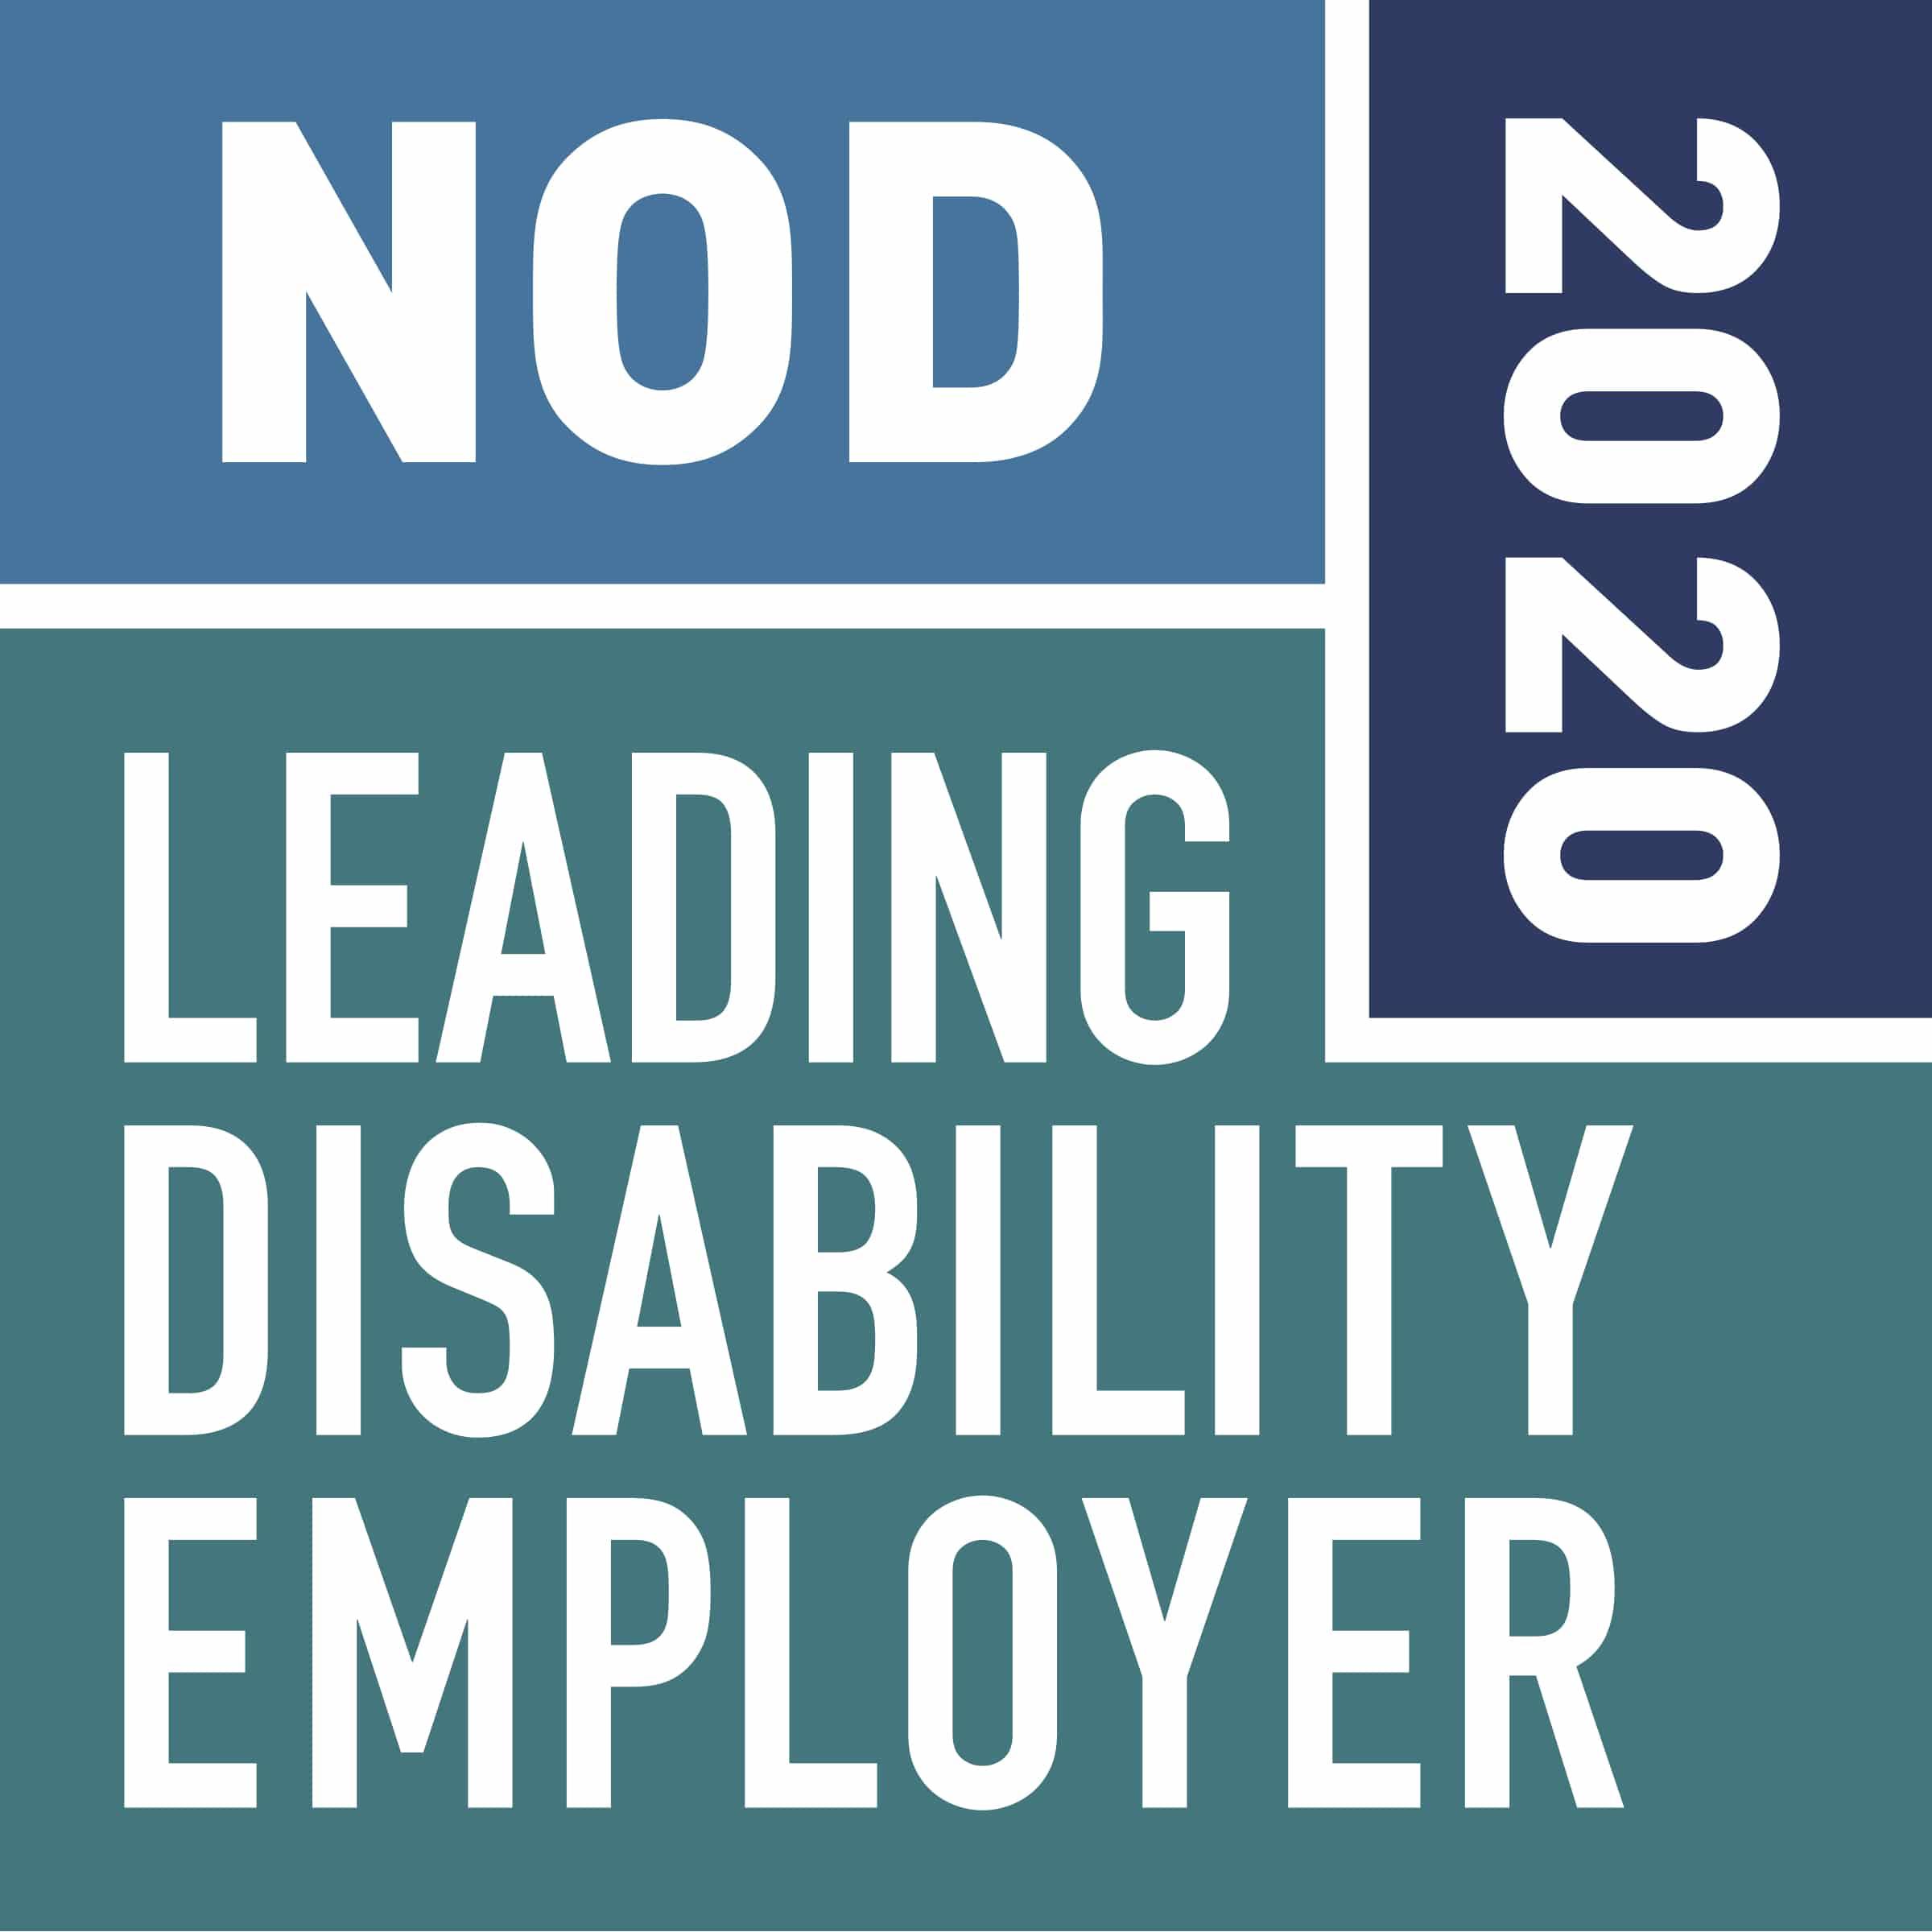 Leading Disability Employer seal logo